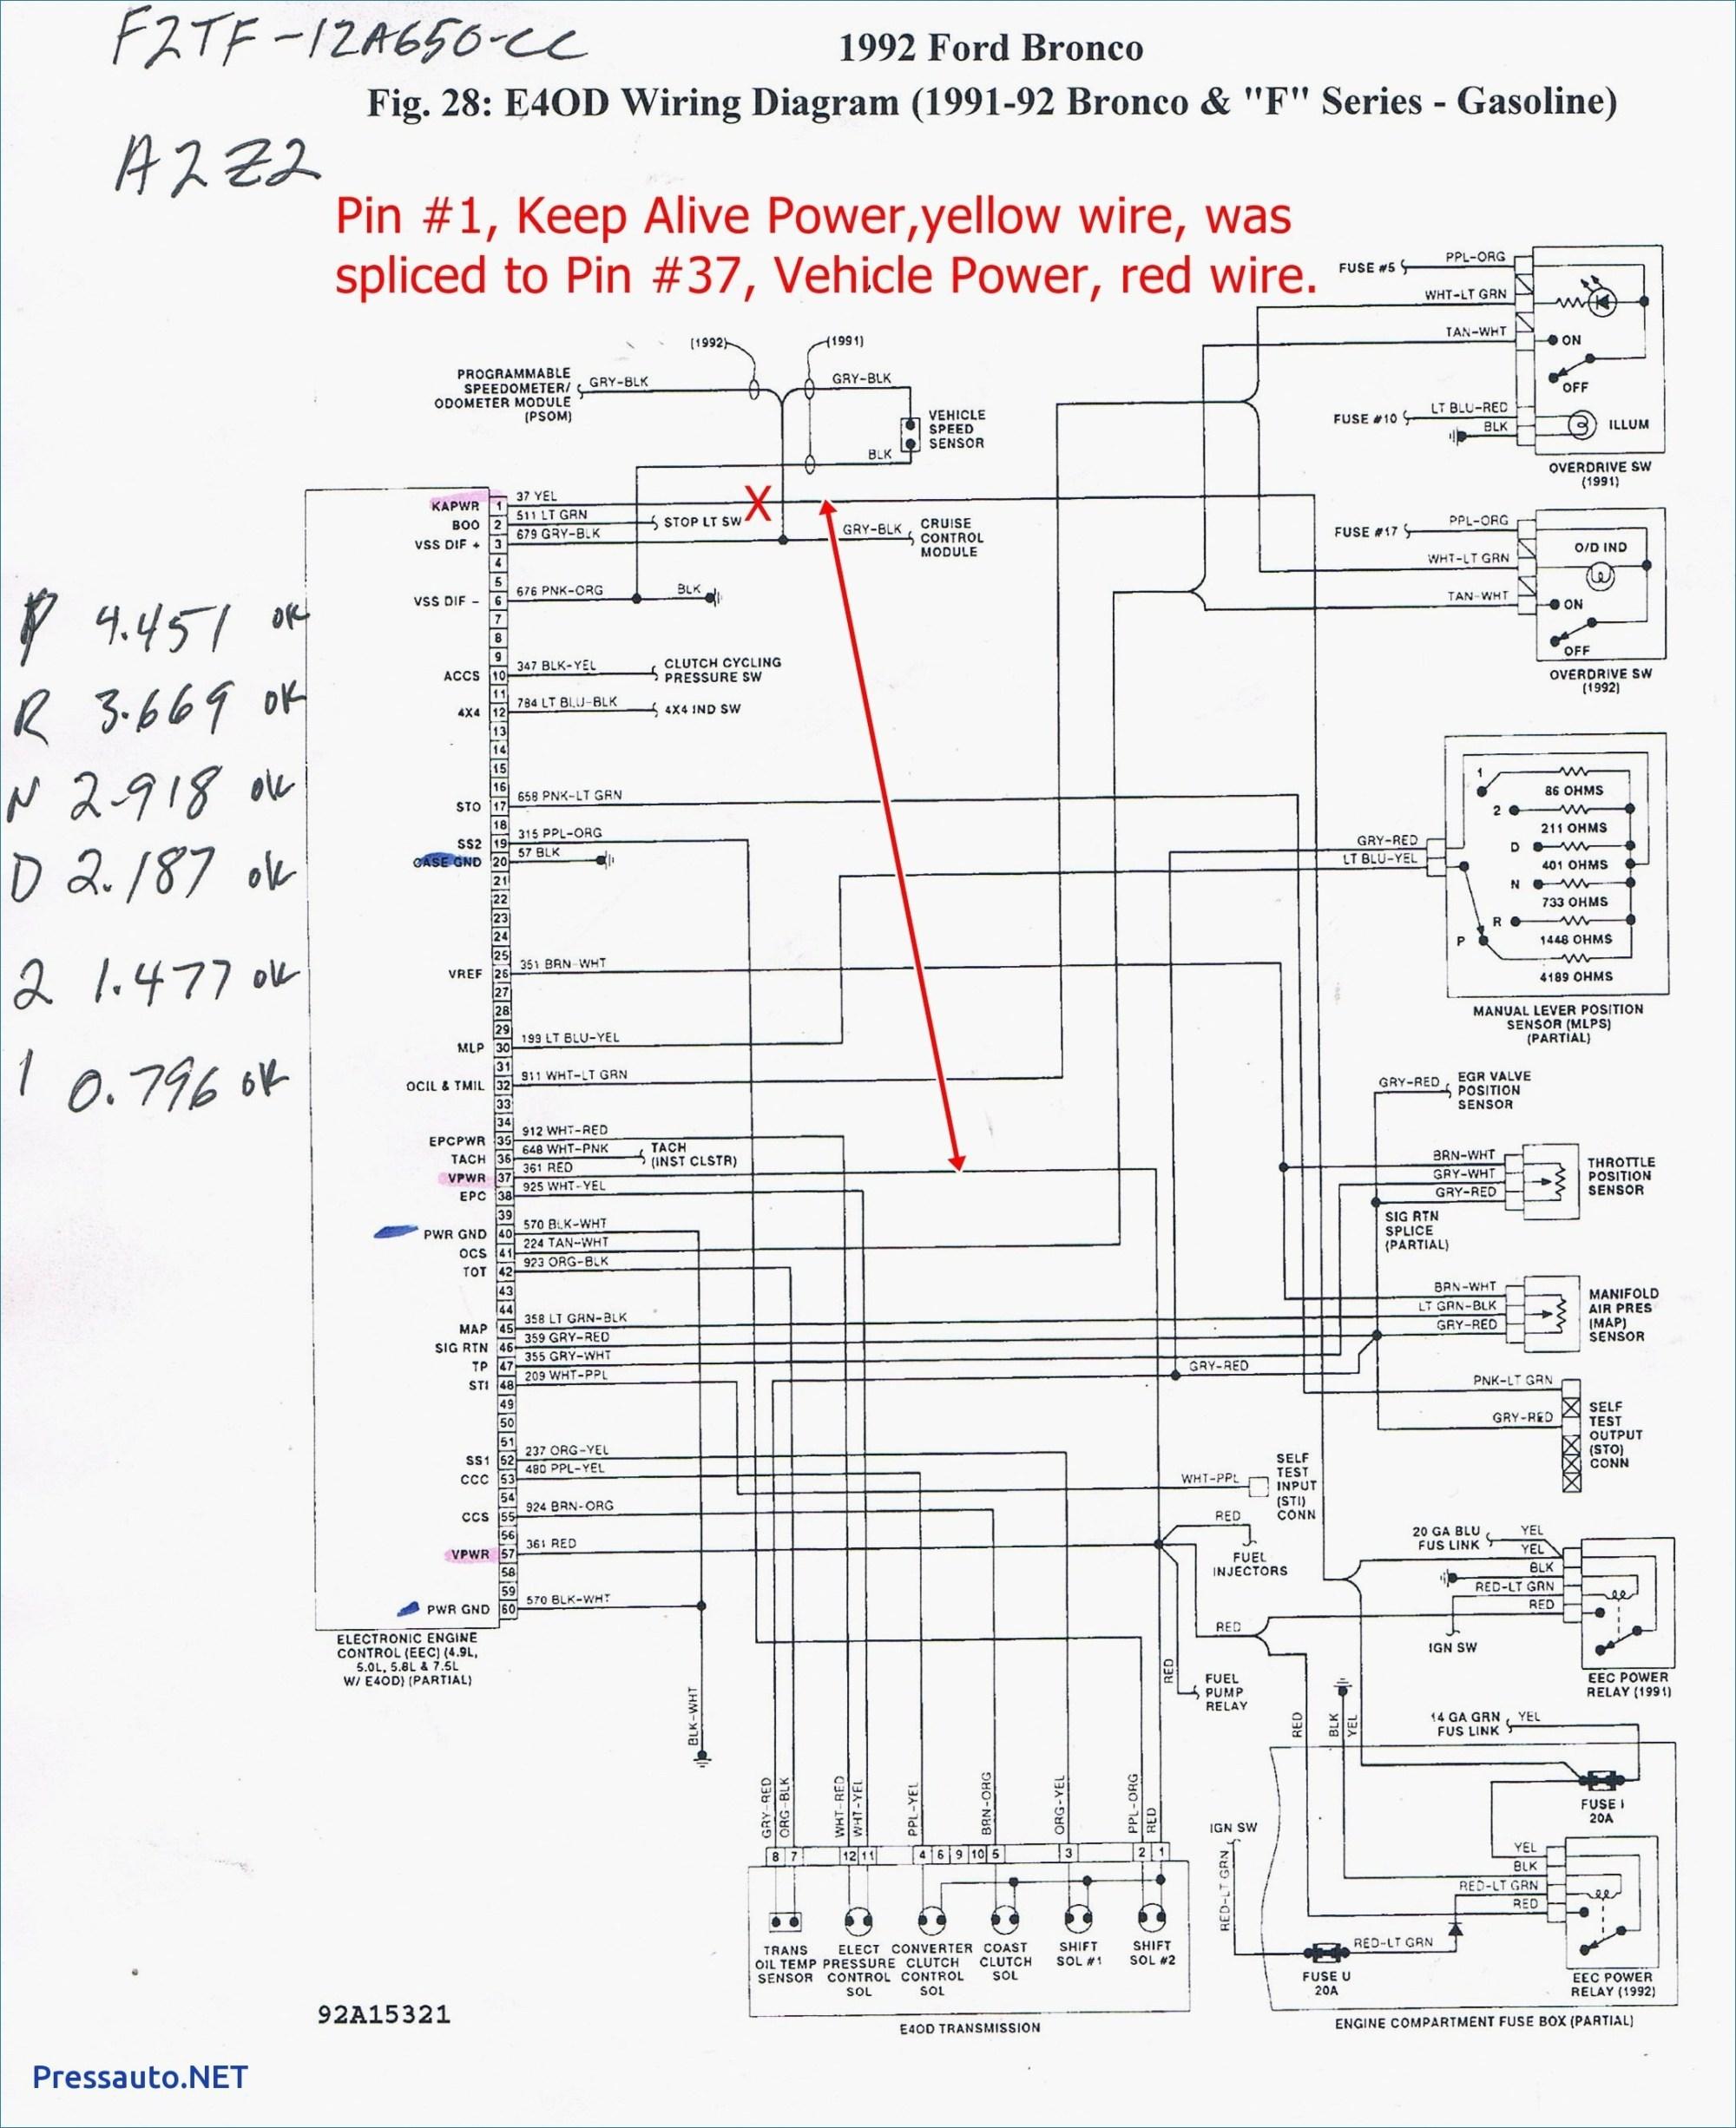 hight resolution of ford f150 radio wiring harness diagram unique ford stereo wiring harness diagram copy 2014 ford f150 1999 dodge ram 1500